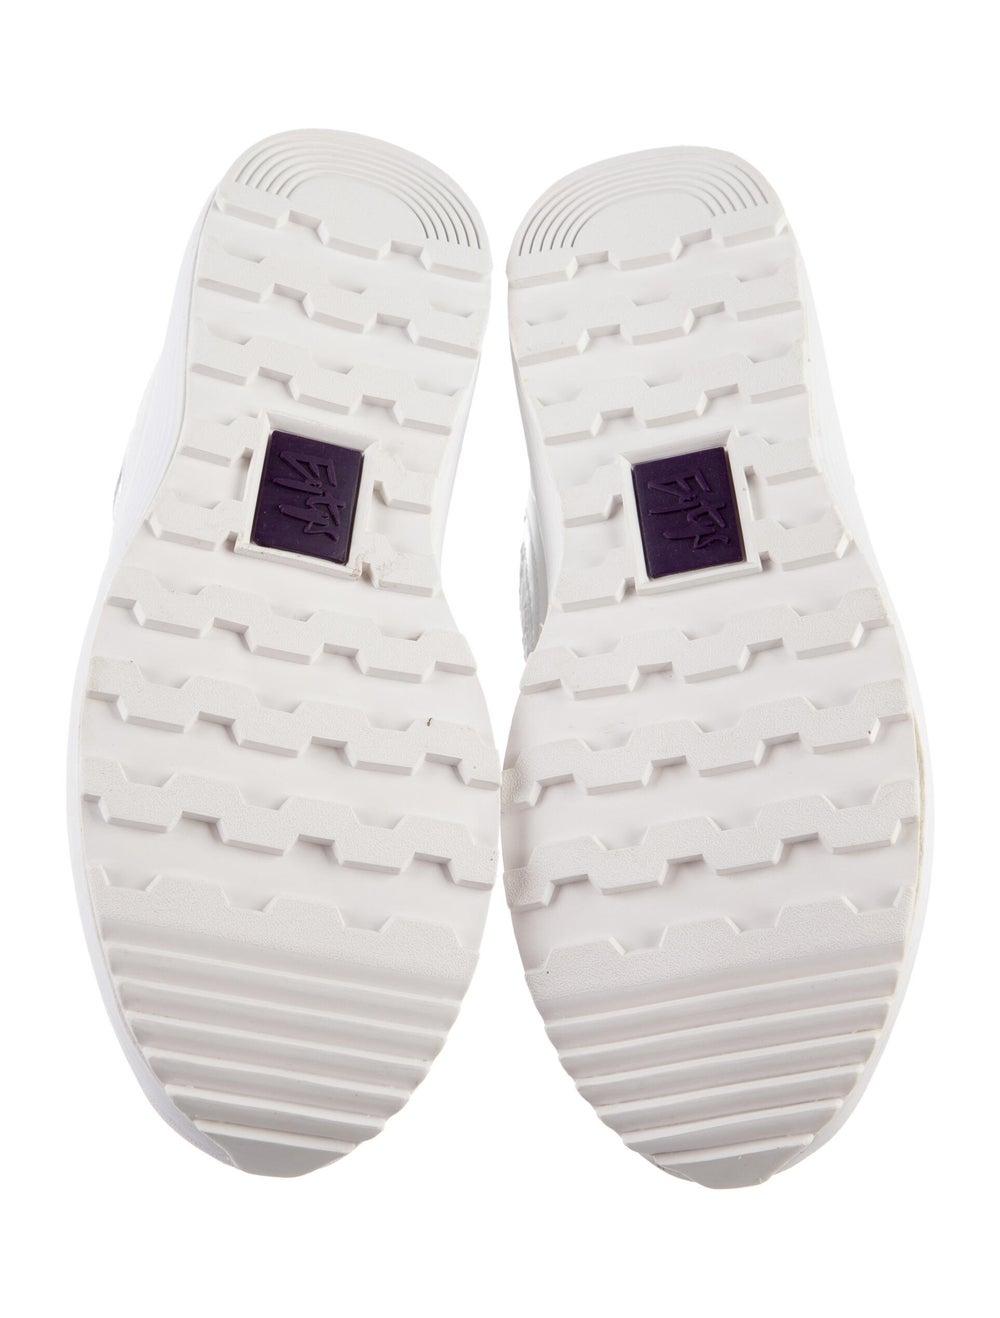 Eytys Snow Sneakers White - image 5